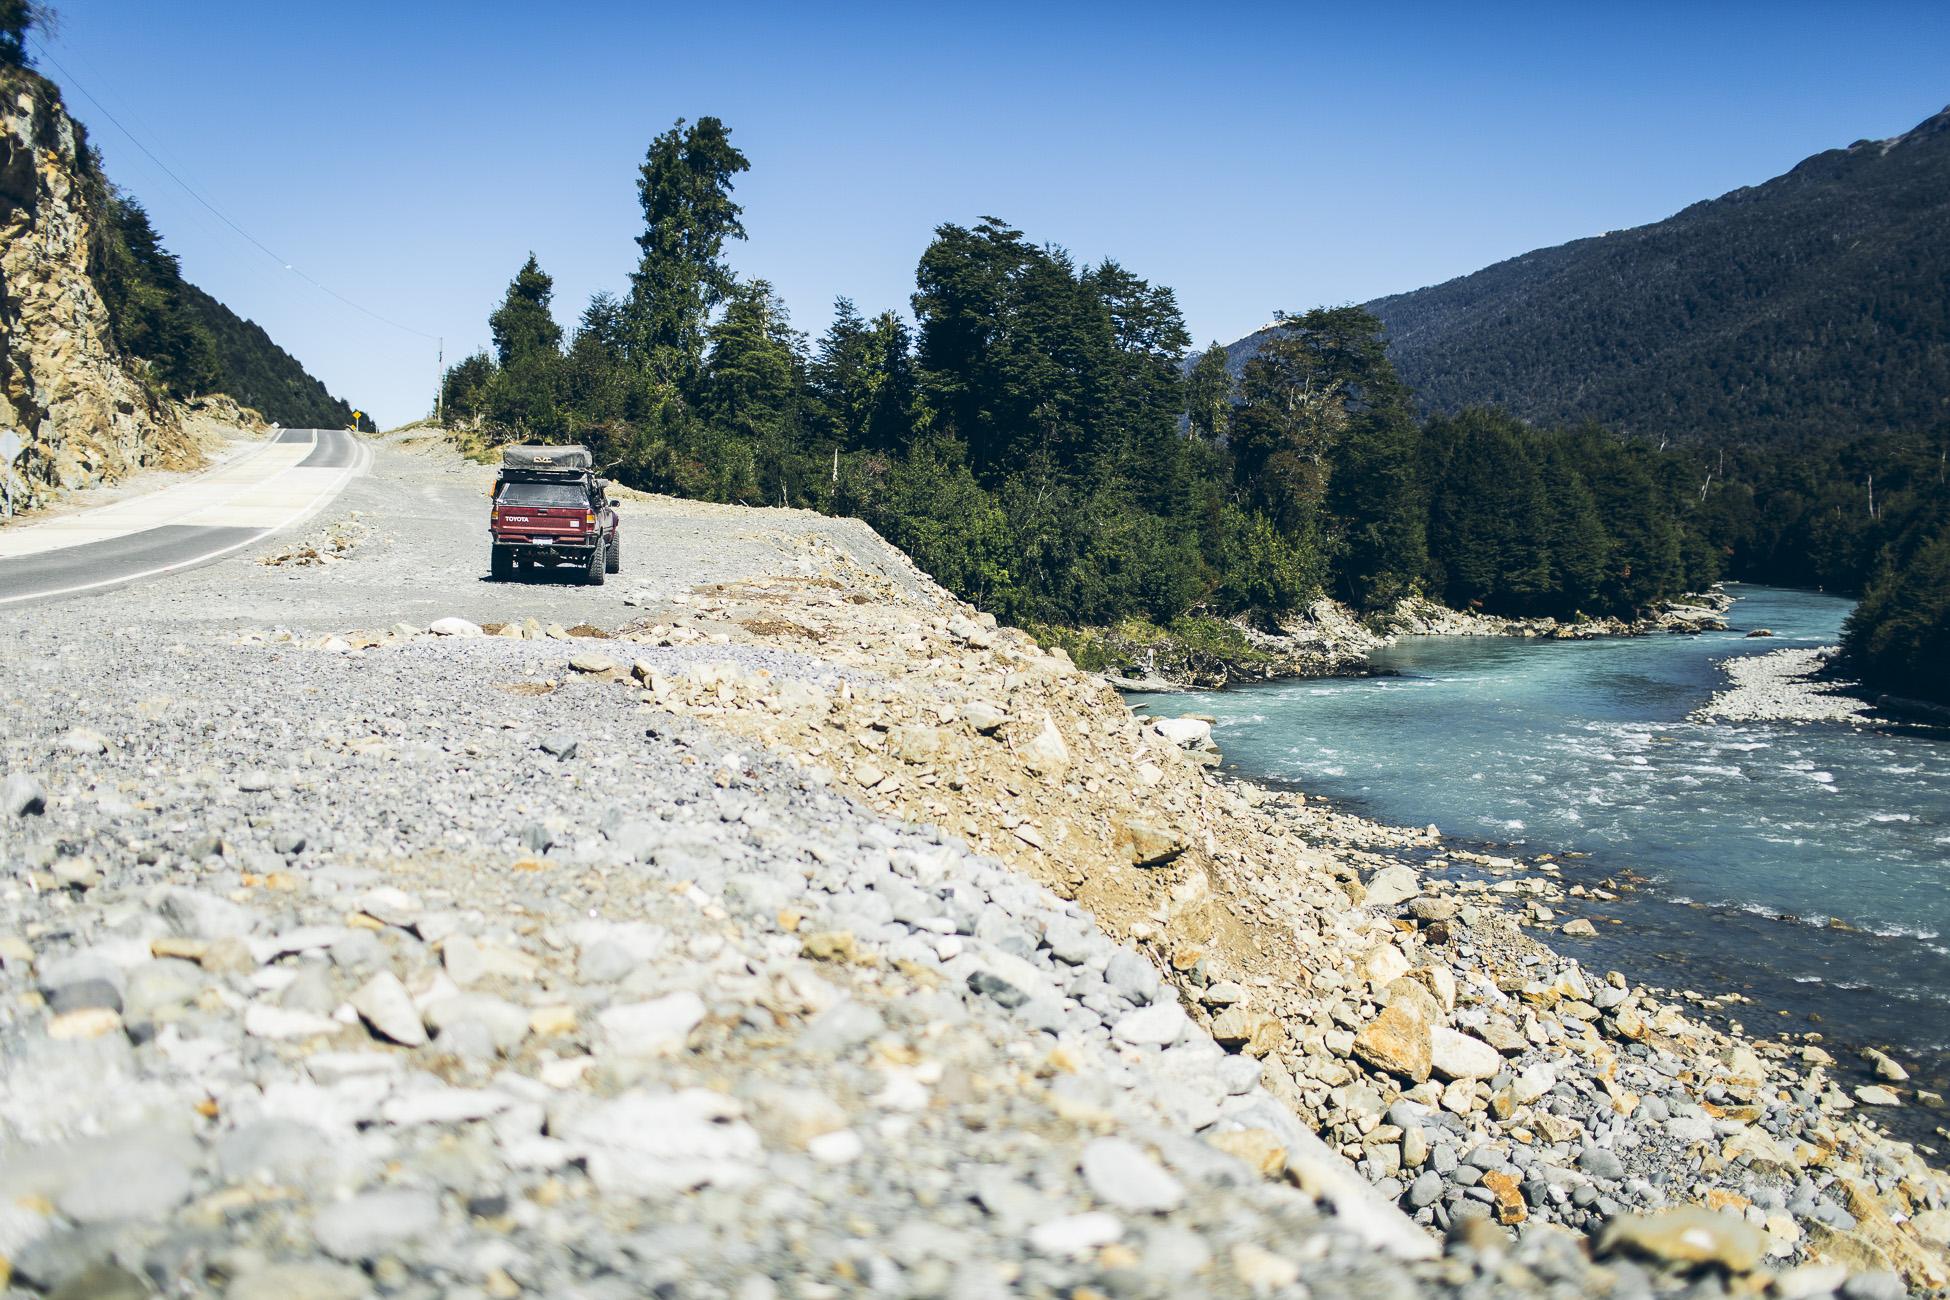 desktoglory_carretera_austral-37